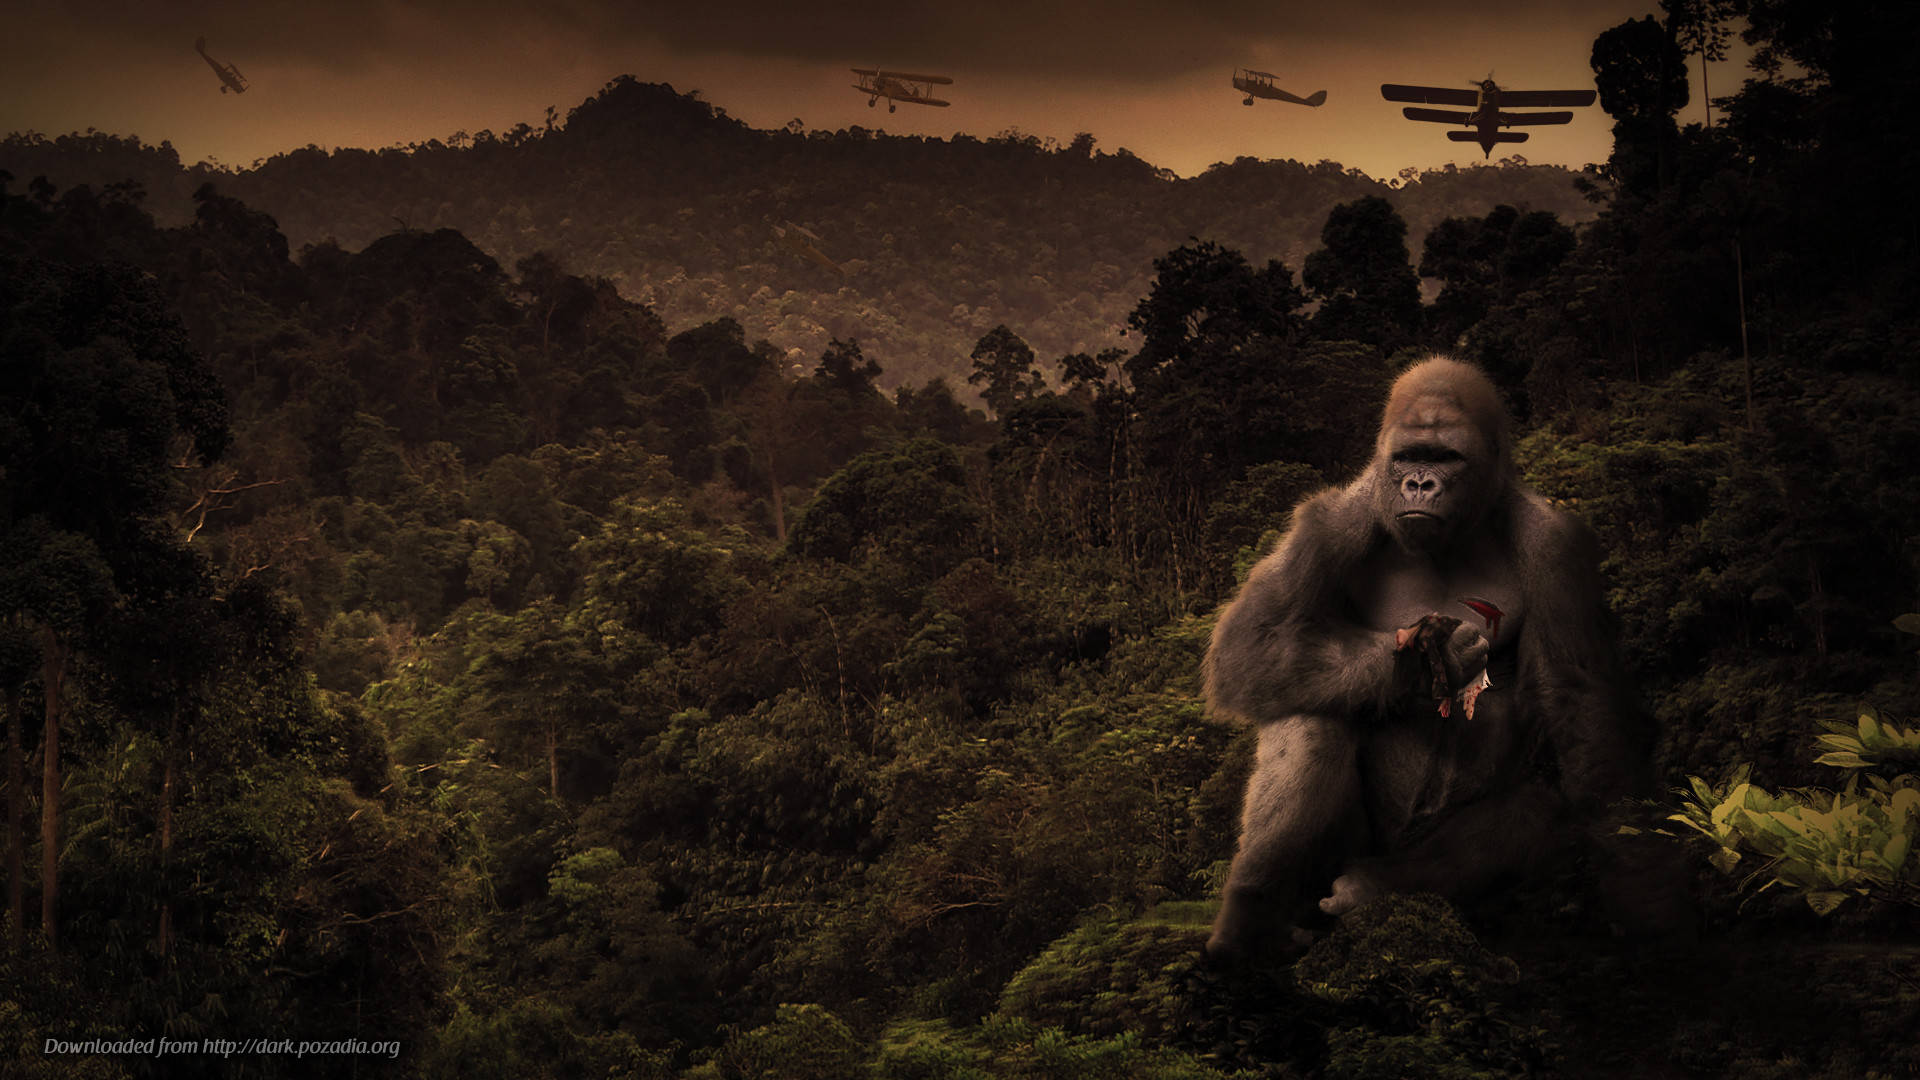 King Kong Vs Godzilla HD Wide Wallpaper for Widescreen (70 Wallpapers)